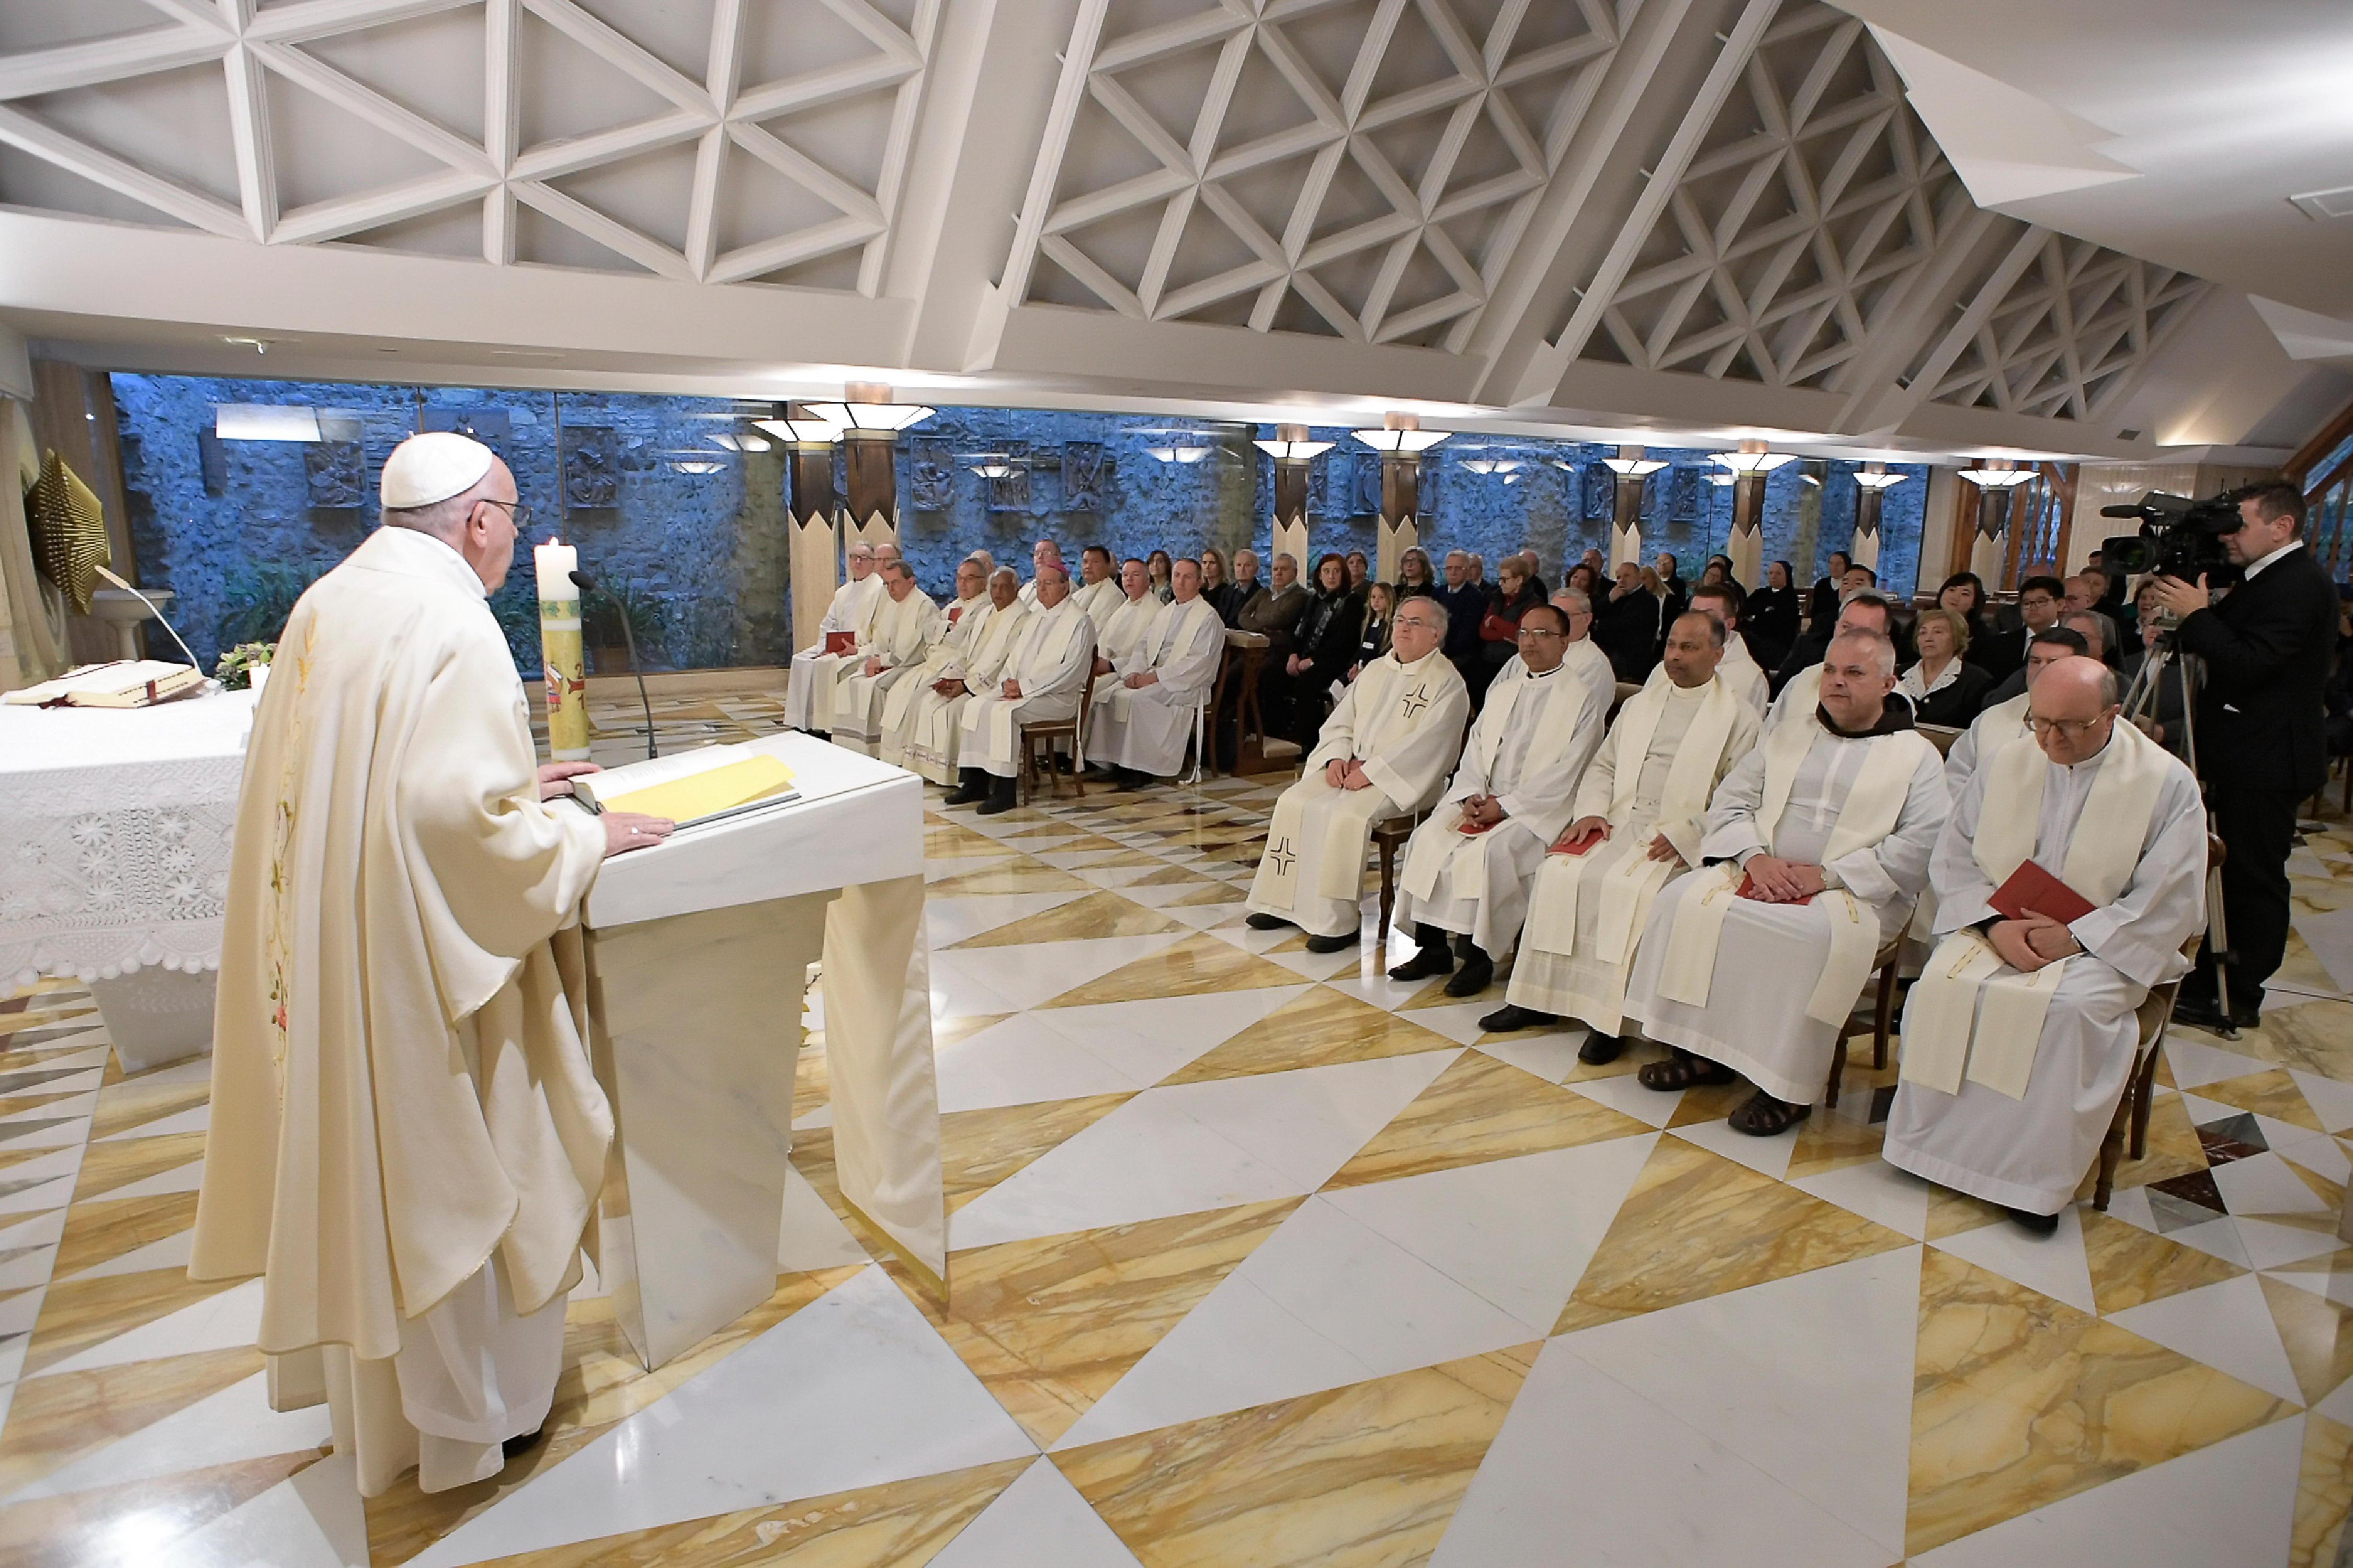 Eucaristía en Santa Marta 12/04/2018 © Vatican Media